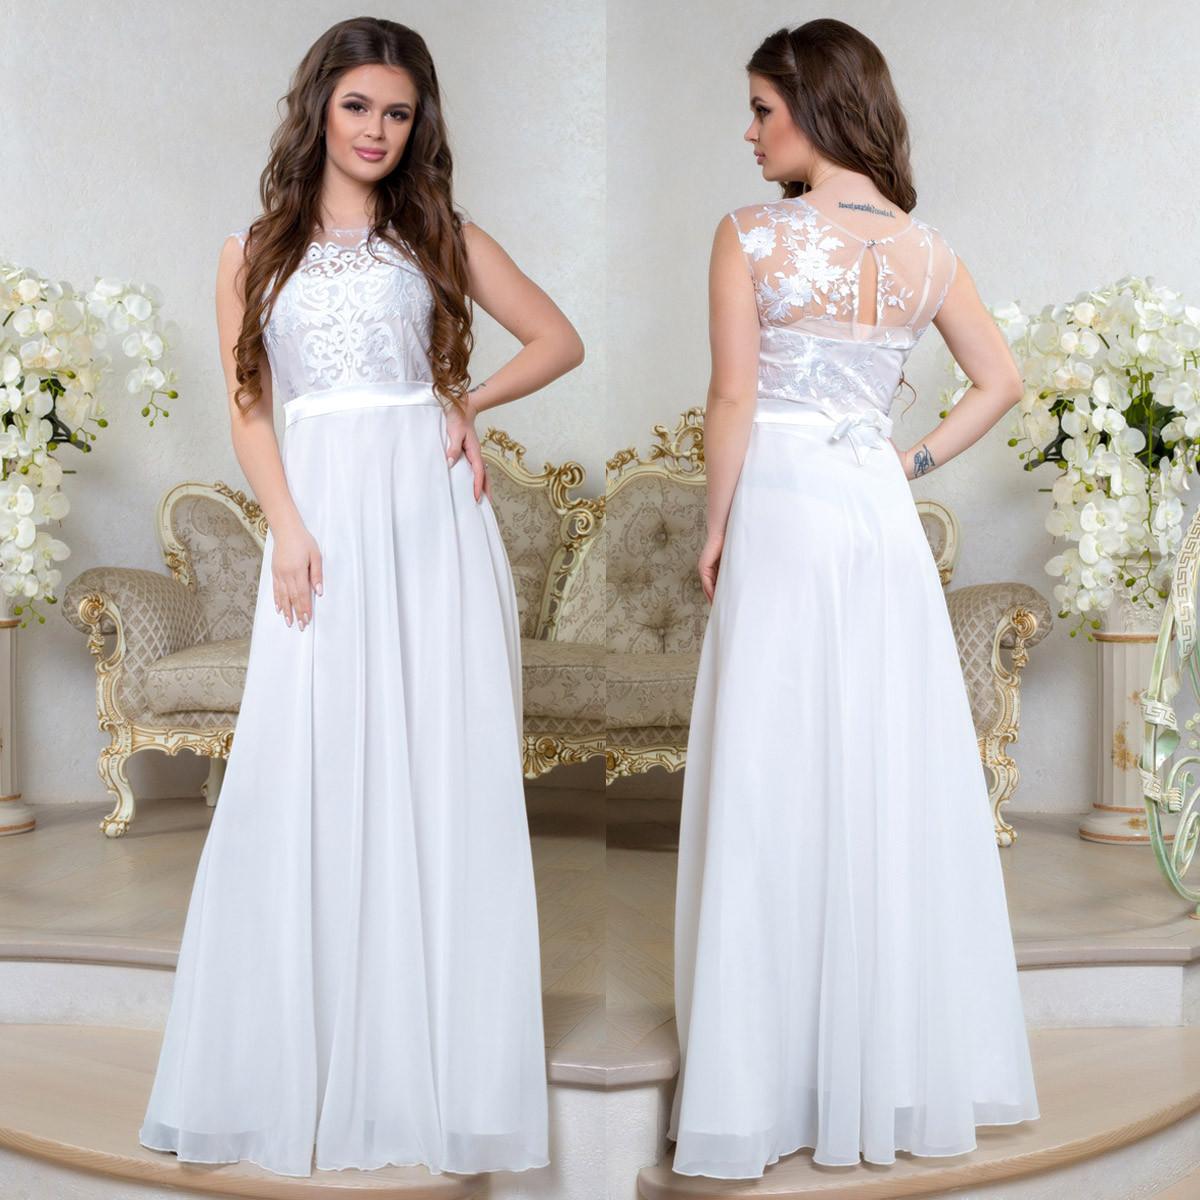 57870e1e9b3 Платье белое свадебное